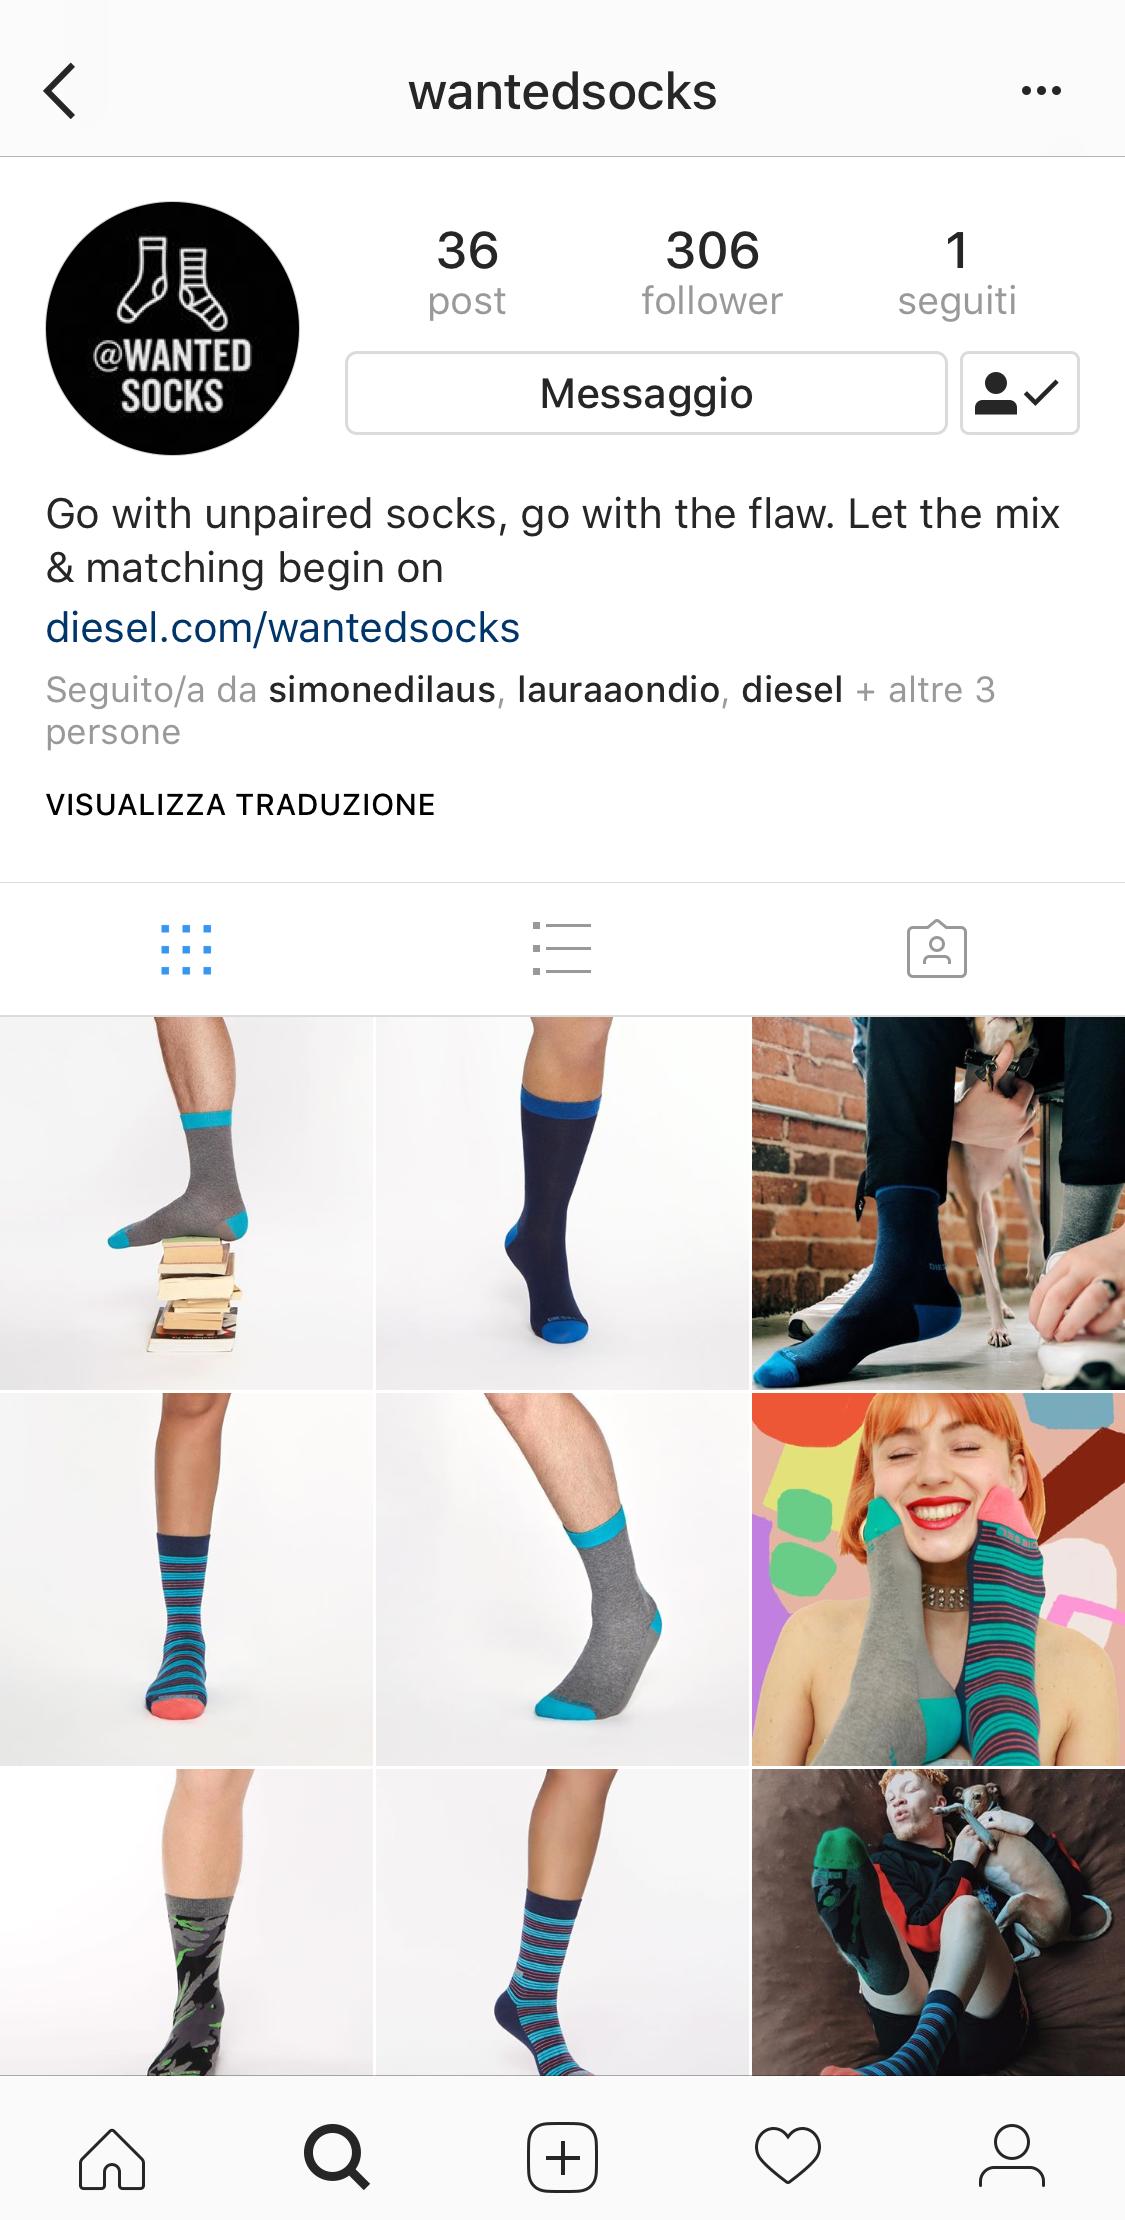 wanted-socks01.PNG